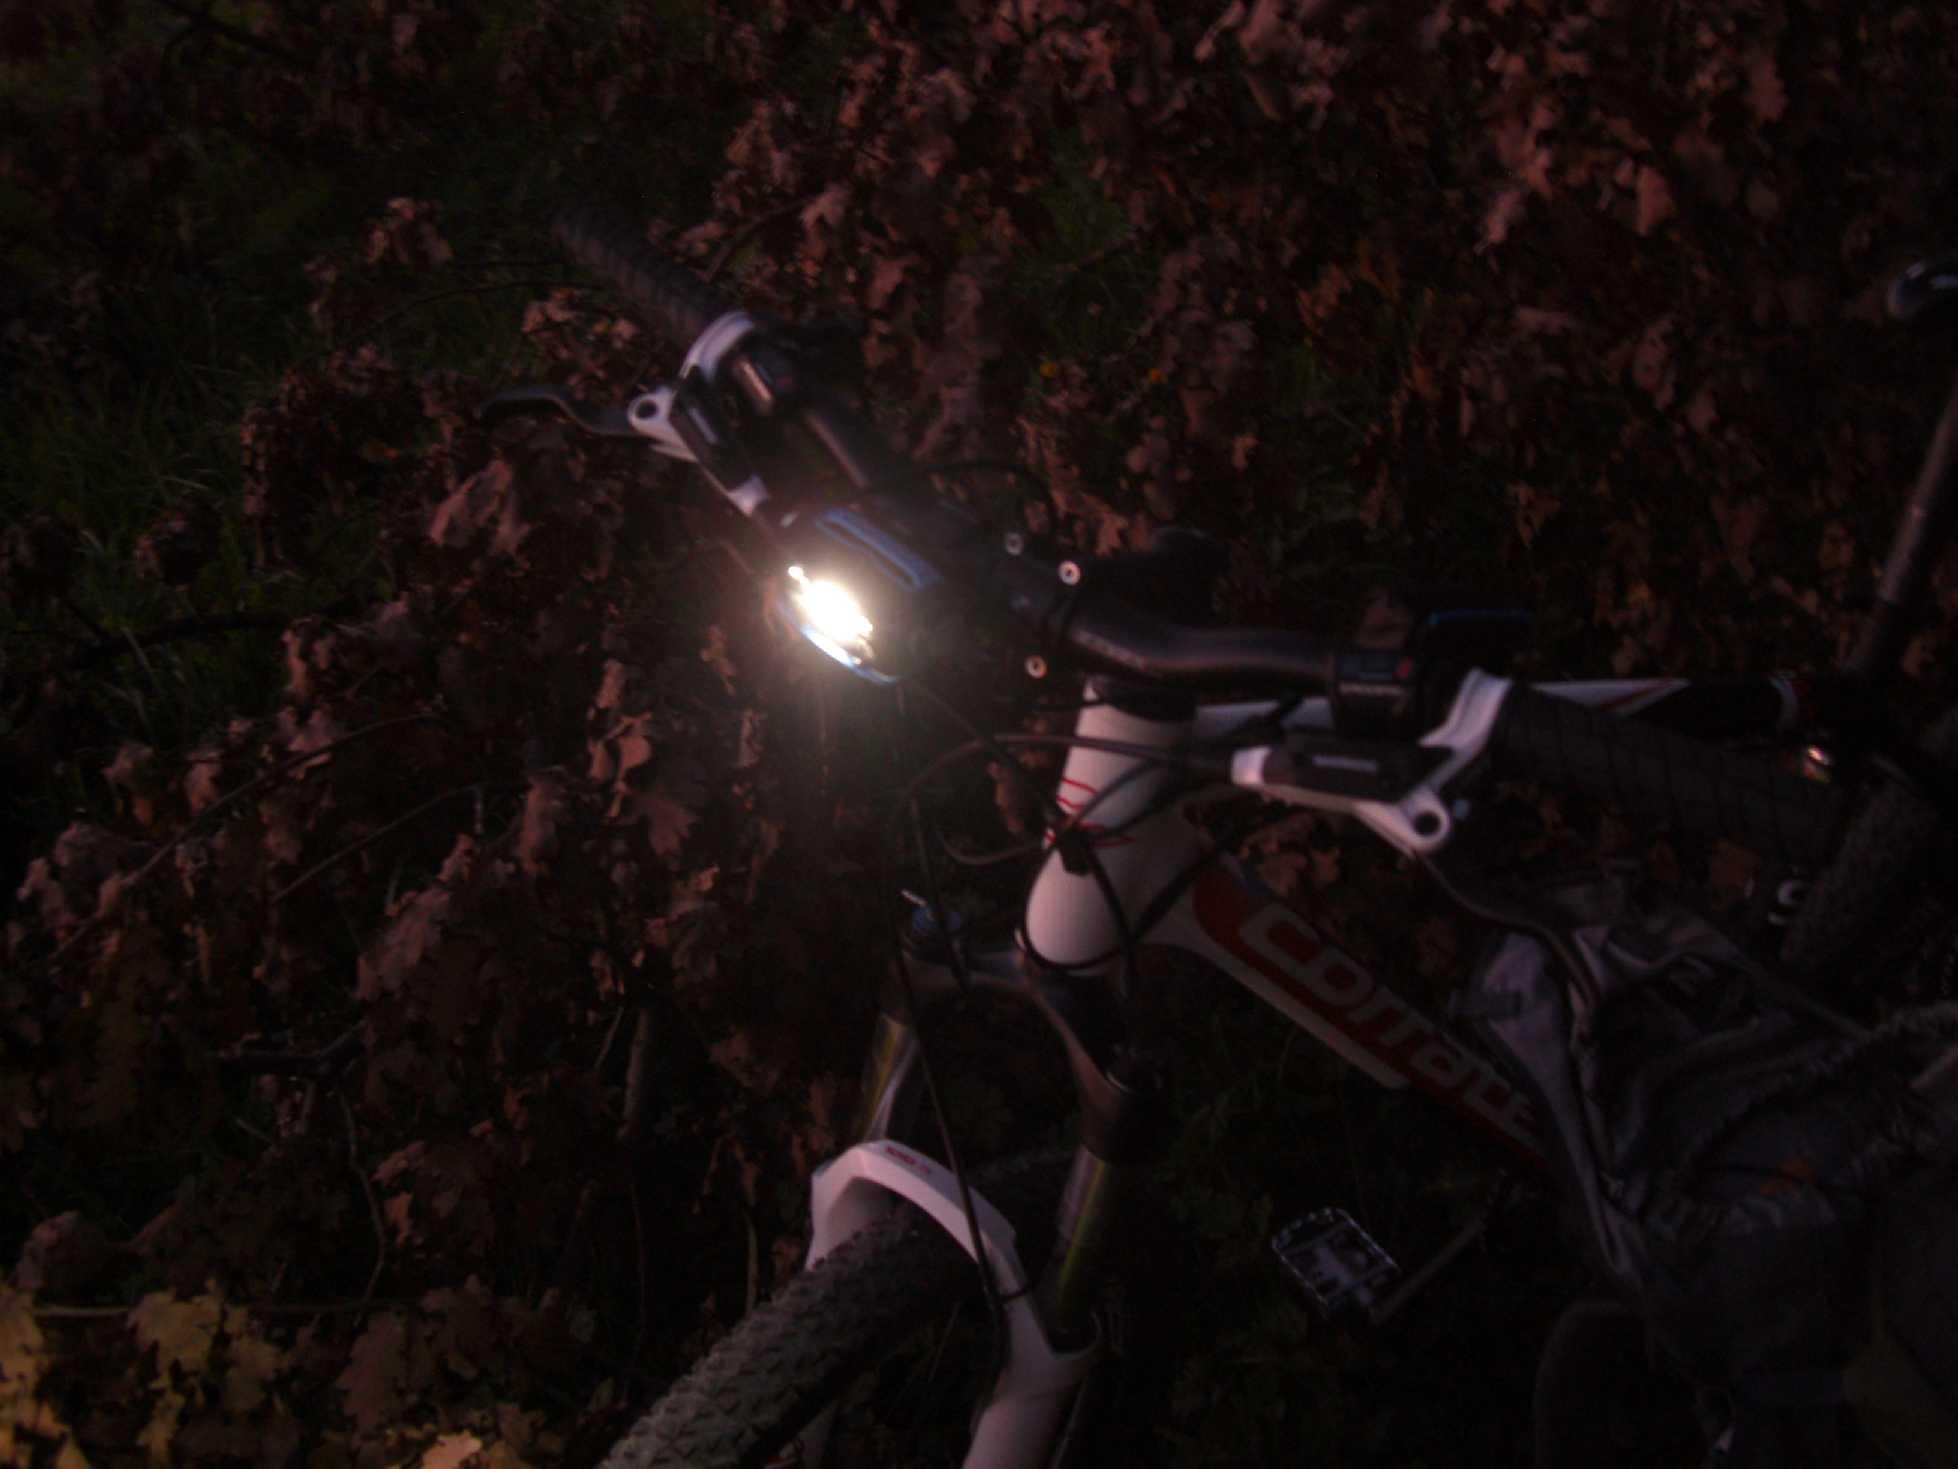 Silva Sprint am Bike